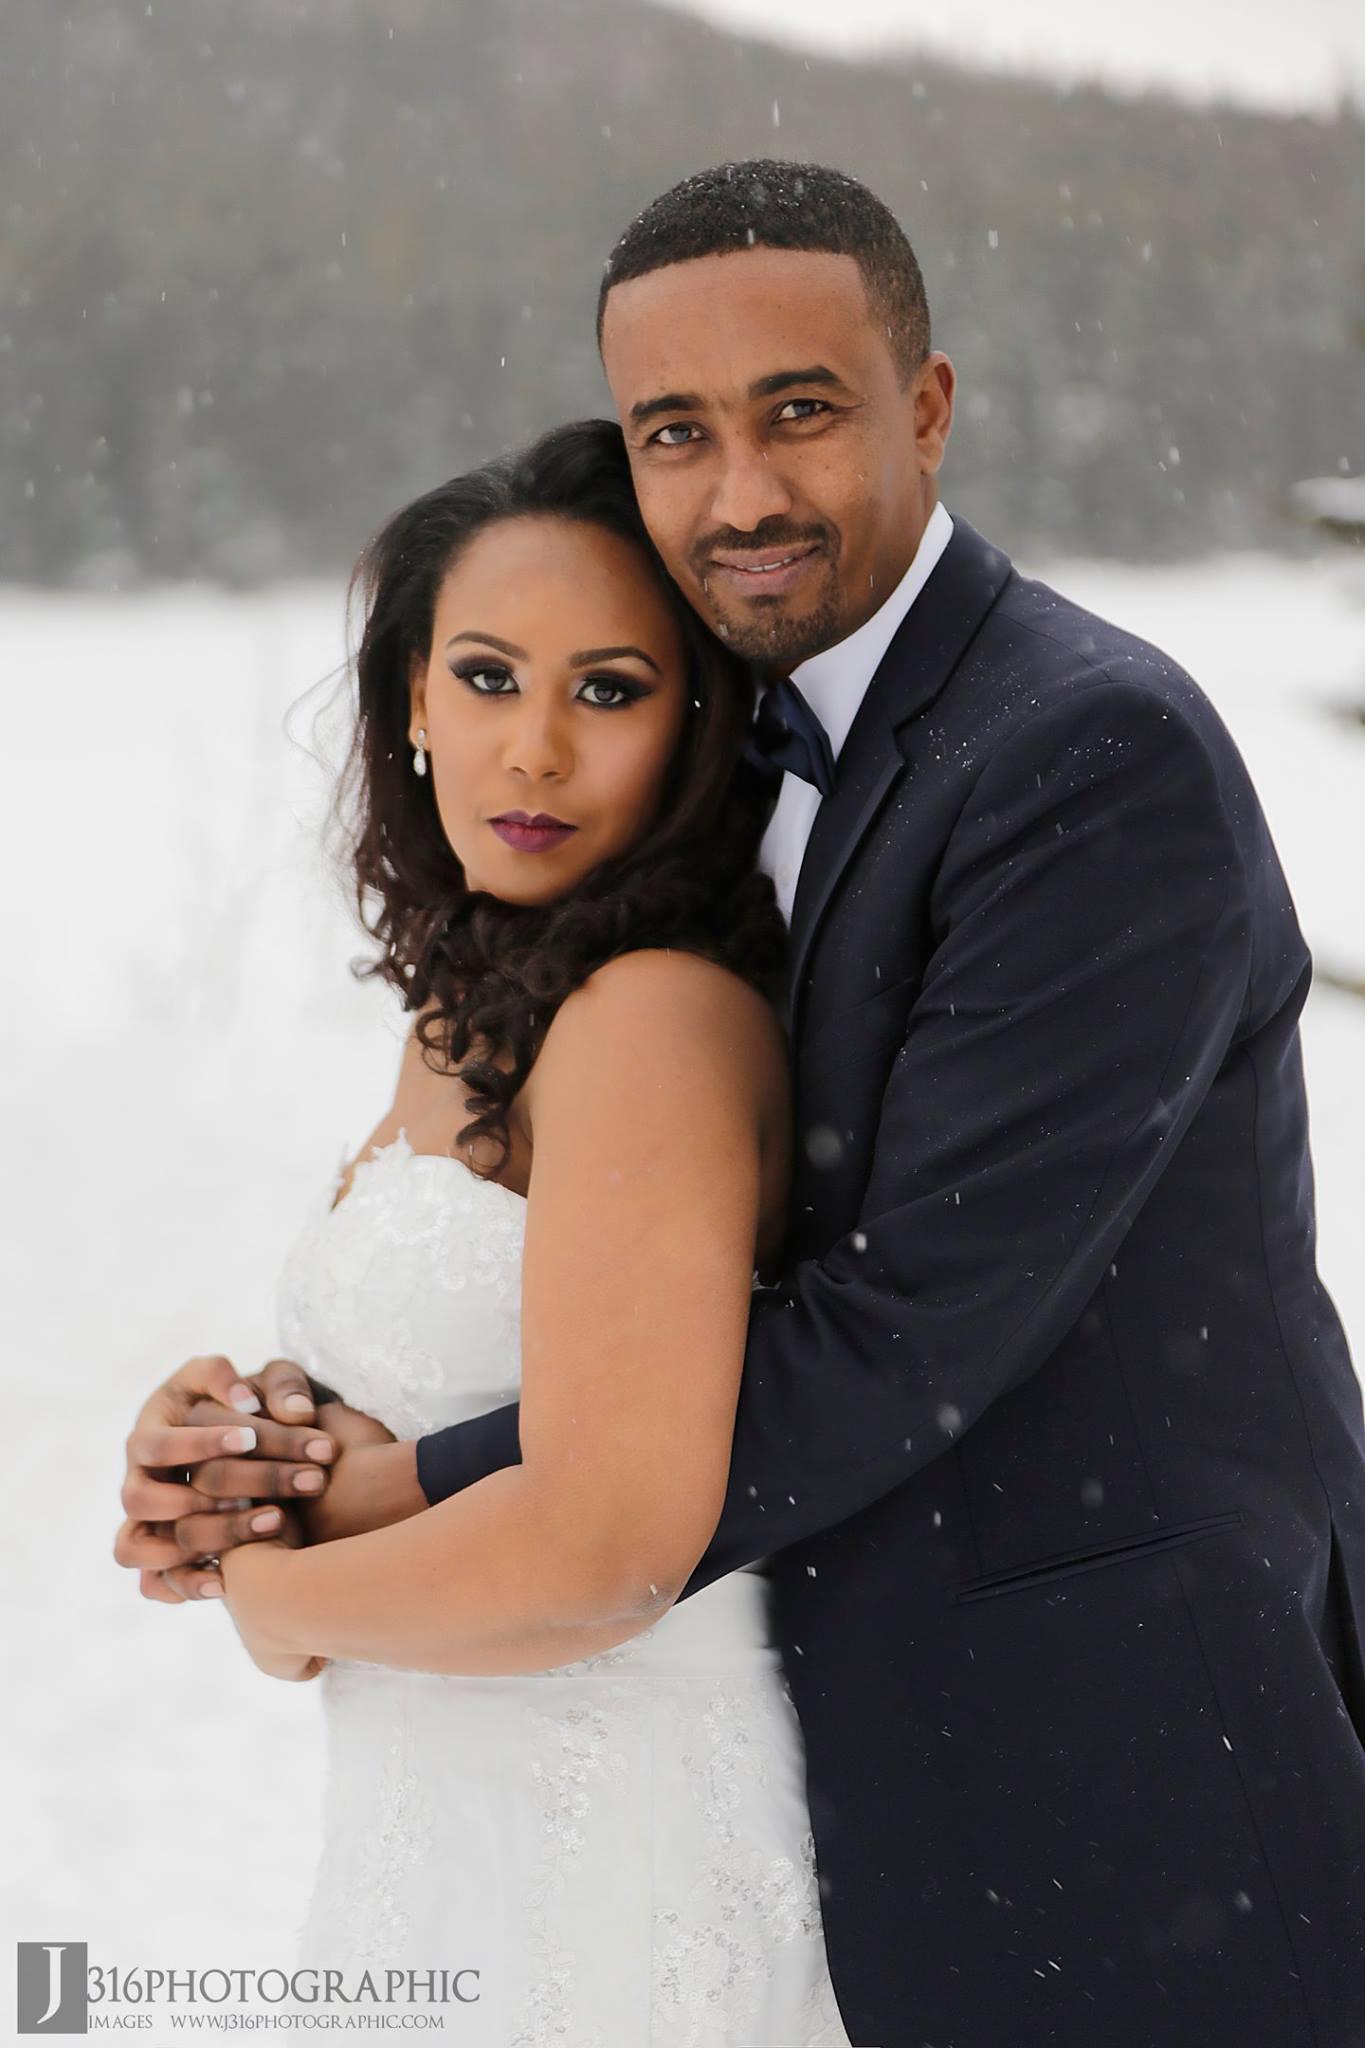 Banf winter wedding by Monika